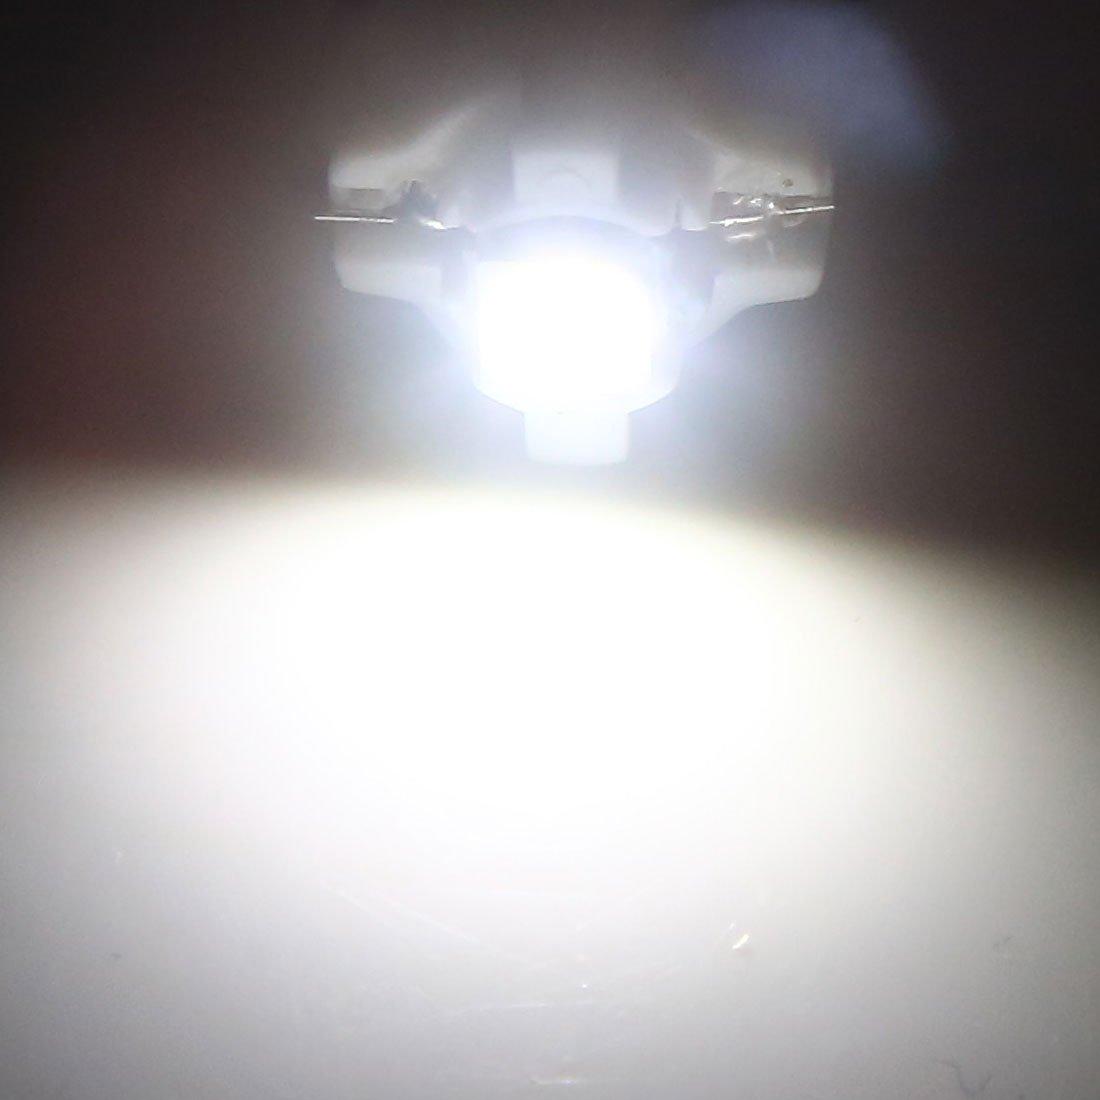 Amazon.com: eDealMax Interior del coche B8.3D LED Salpicadero Dash cuña de la luz Pilota del bulbo de la lámpara Blanca 17pcs: Automotive